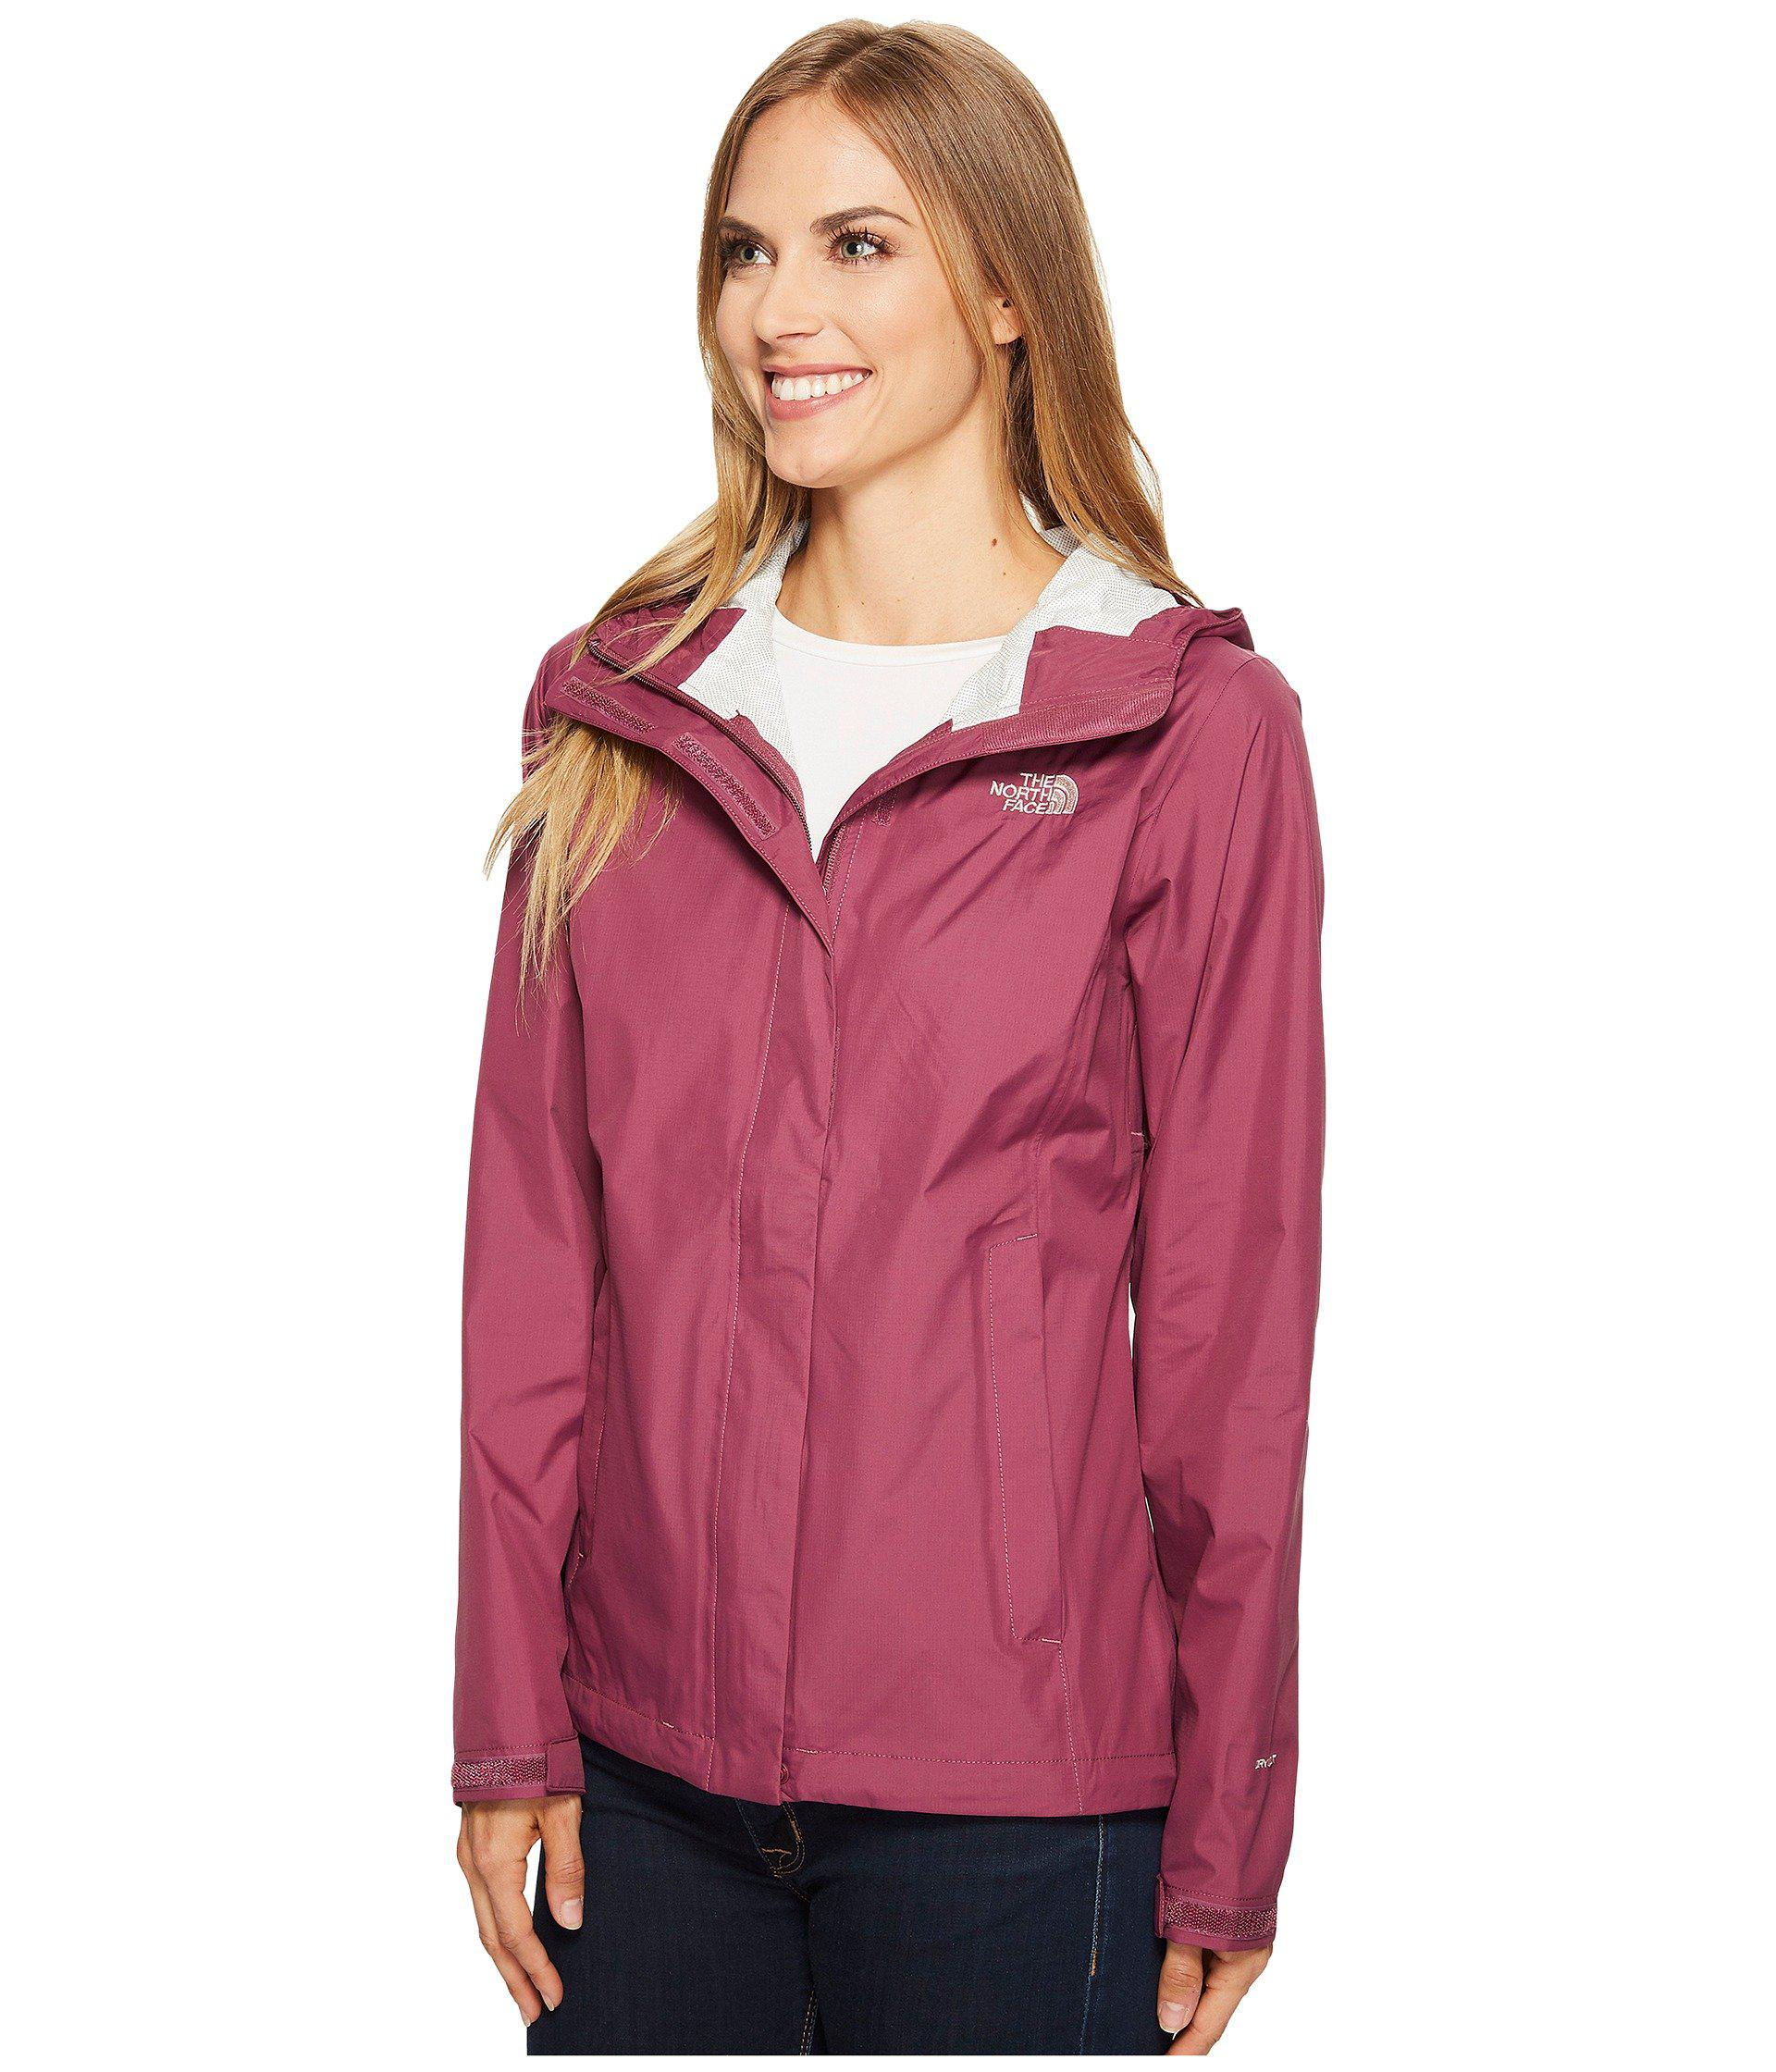 4614adc35 Women's Purple Venture 2 Jacket